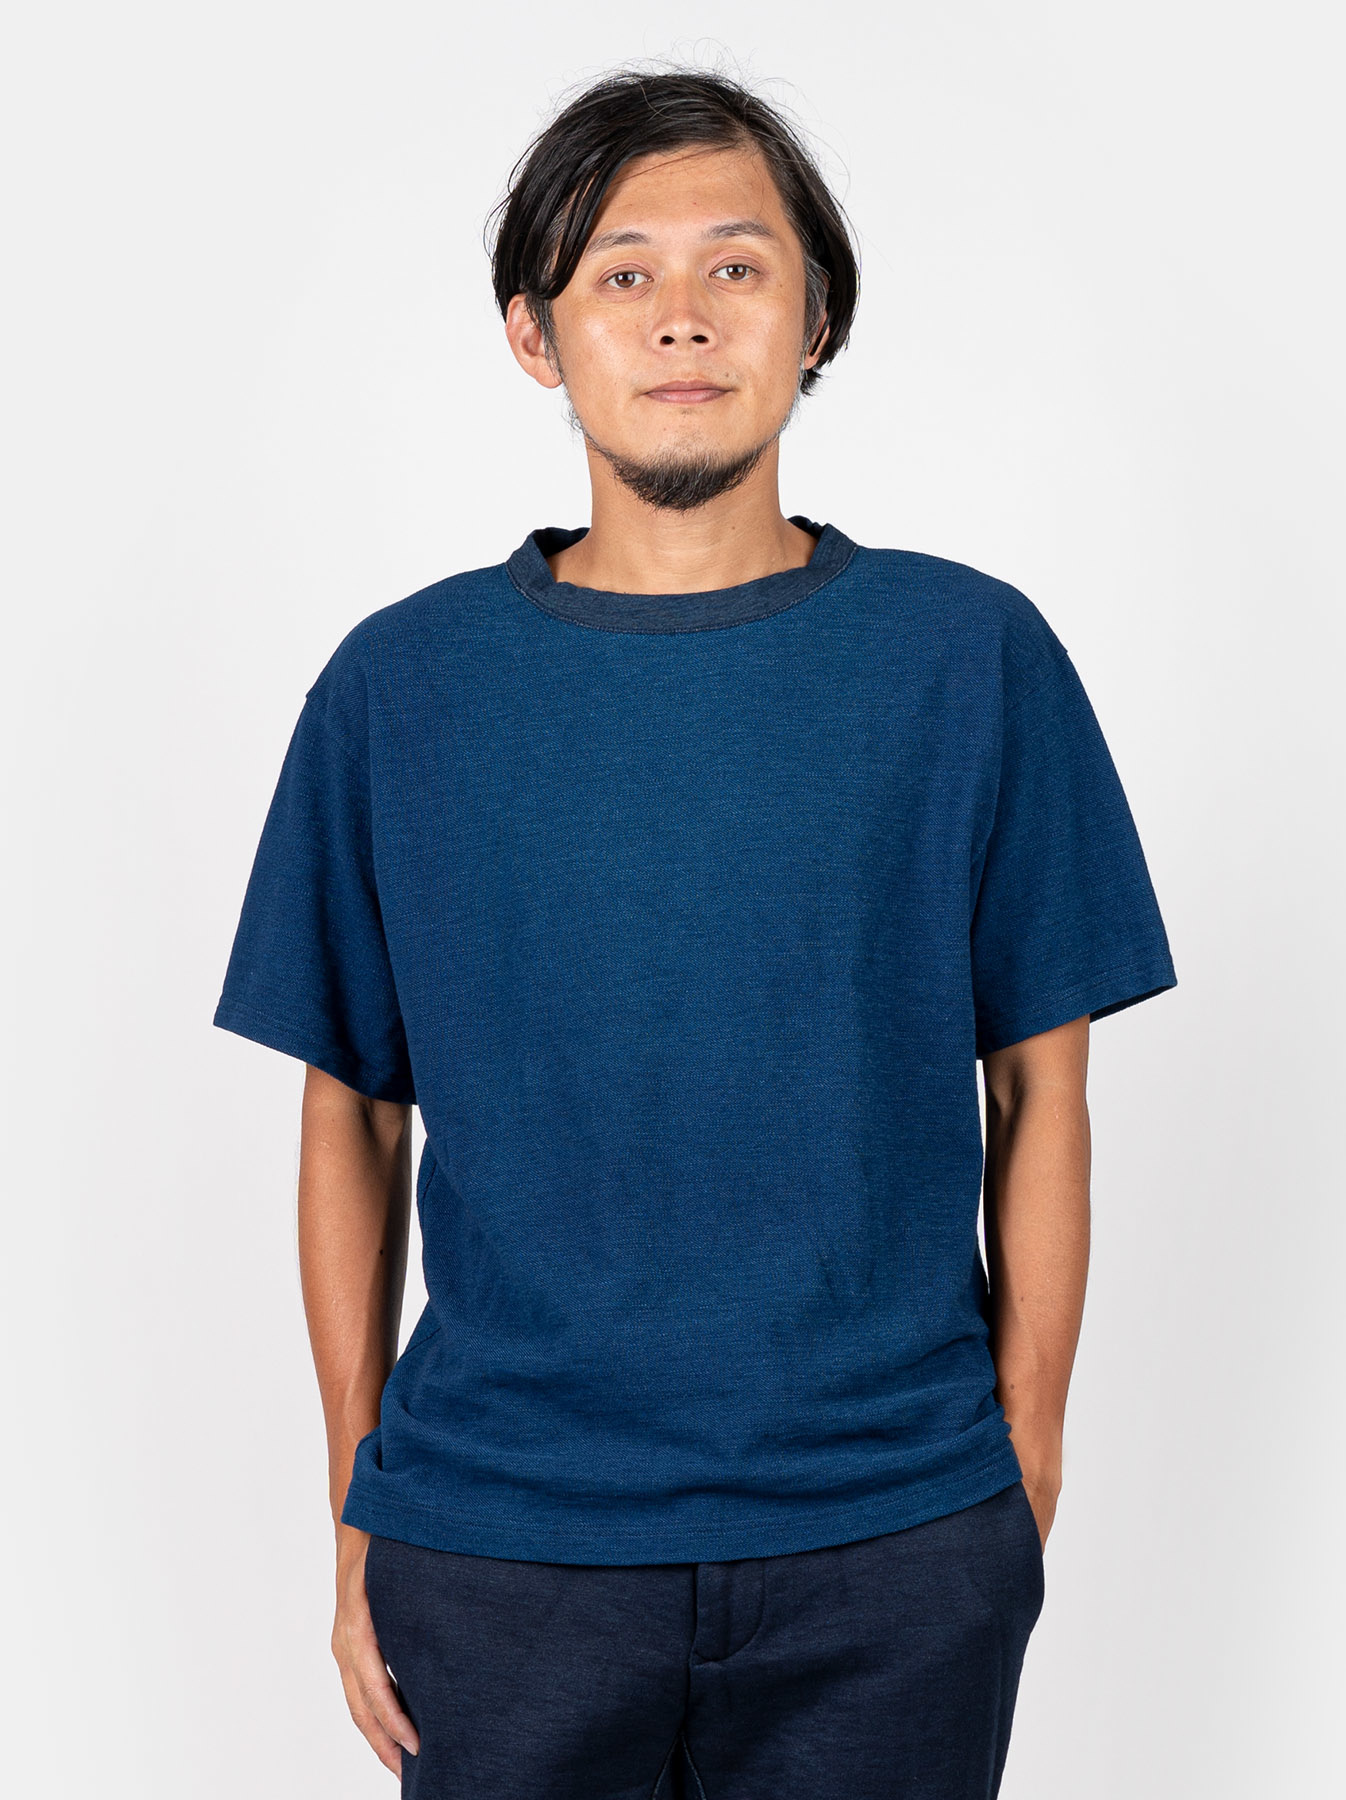 WH Indigo Ultimate Pique T-shirt Distressed-3